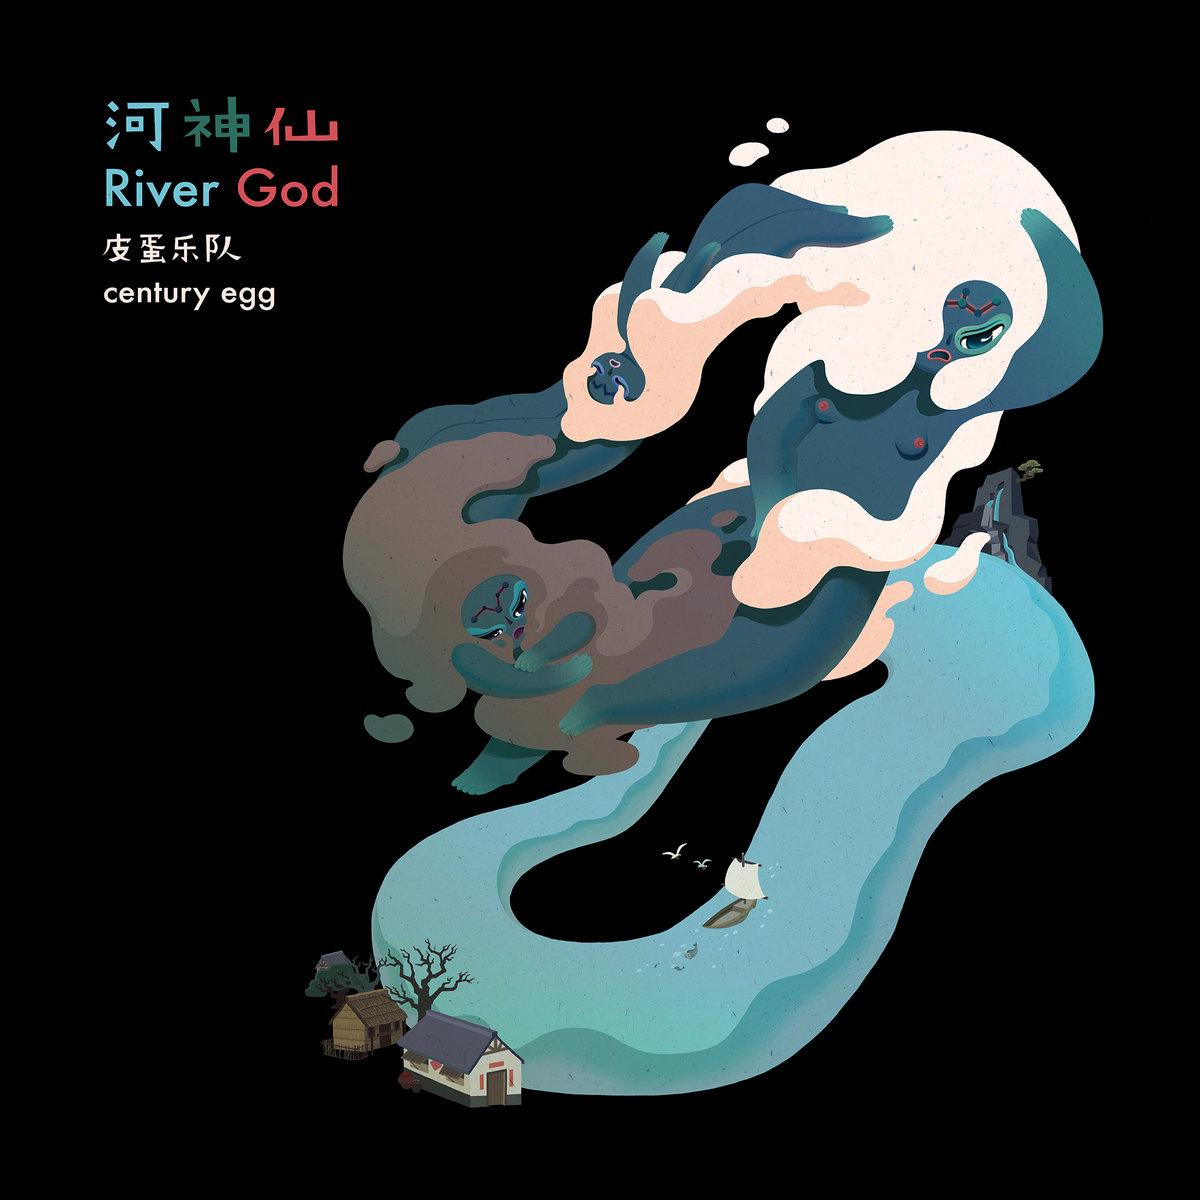 Image result for century egg river god